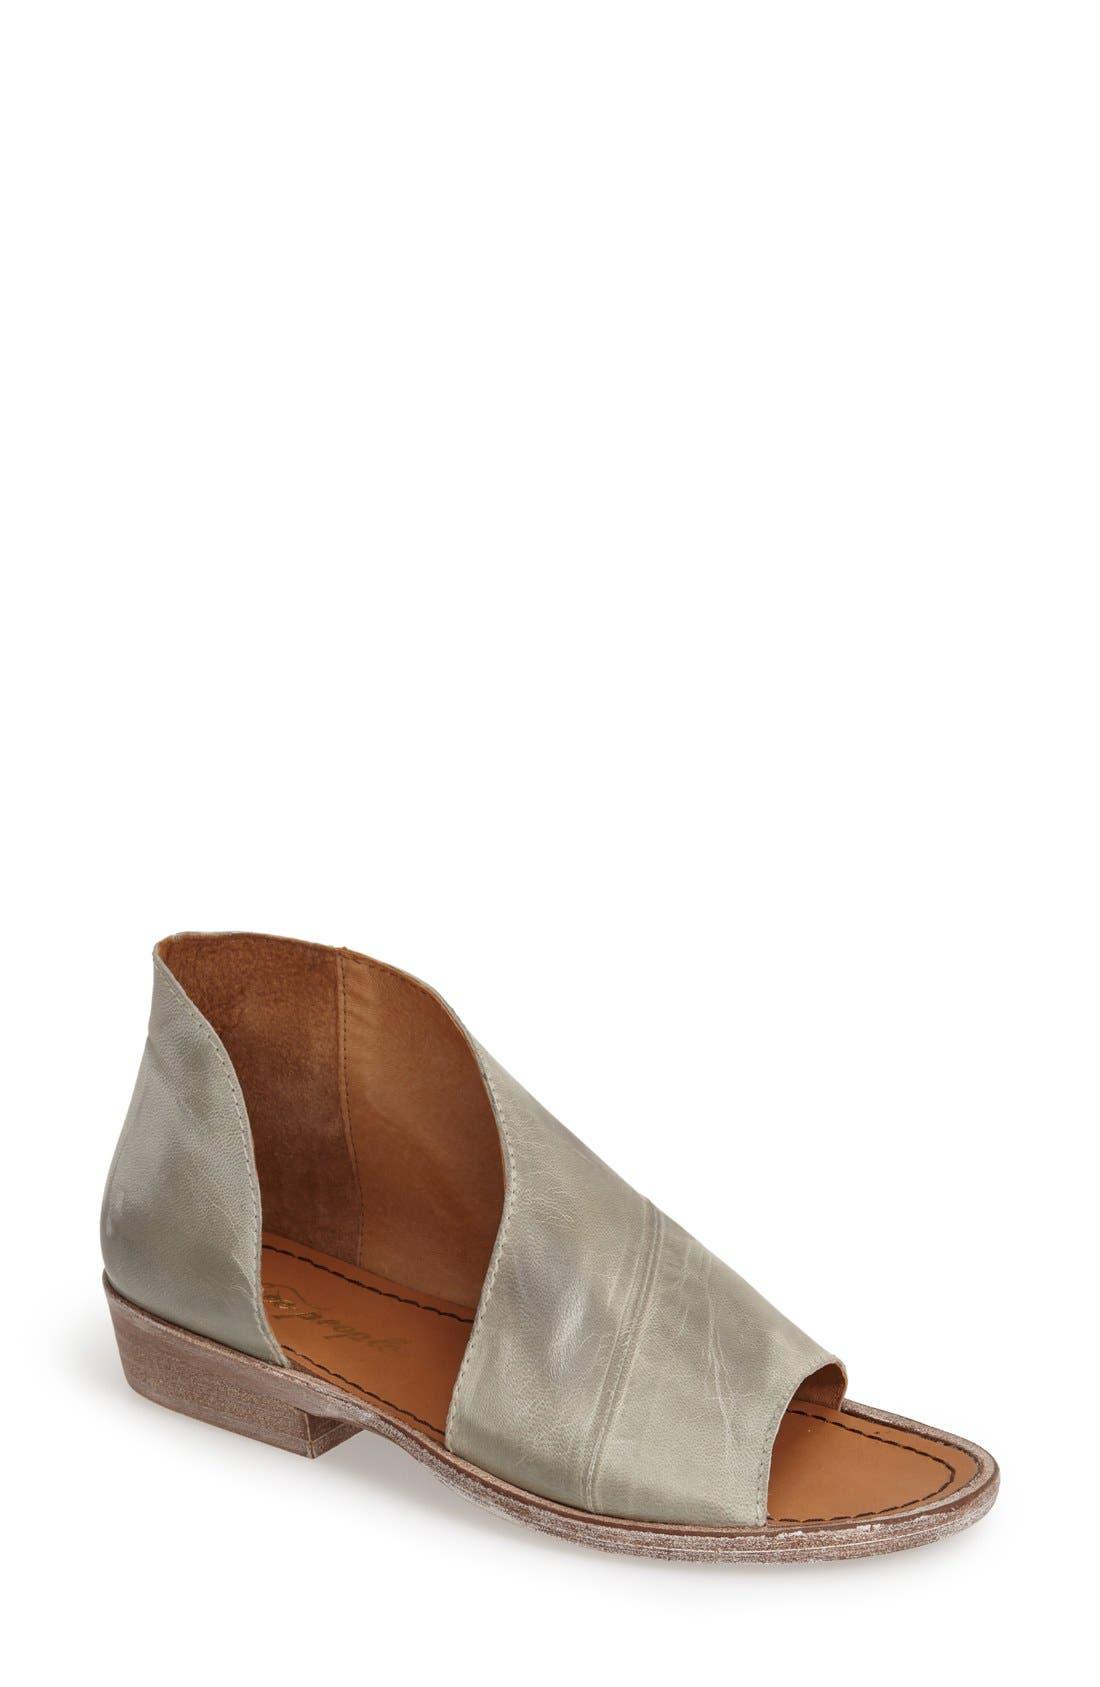 'Mont Blanc' Asymmetrical Sandal,                             Main thumbnail 7, color,